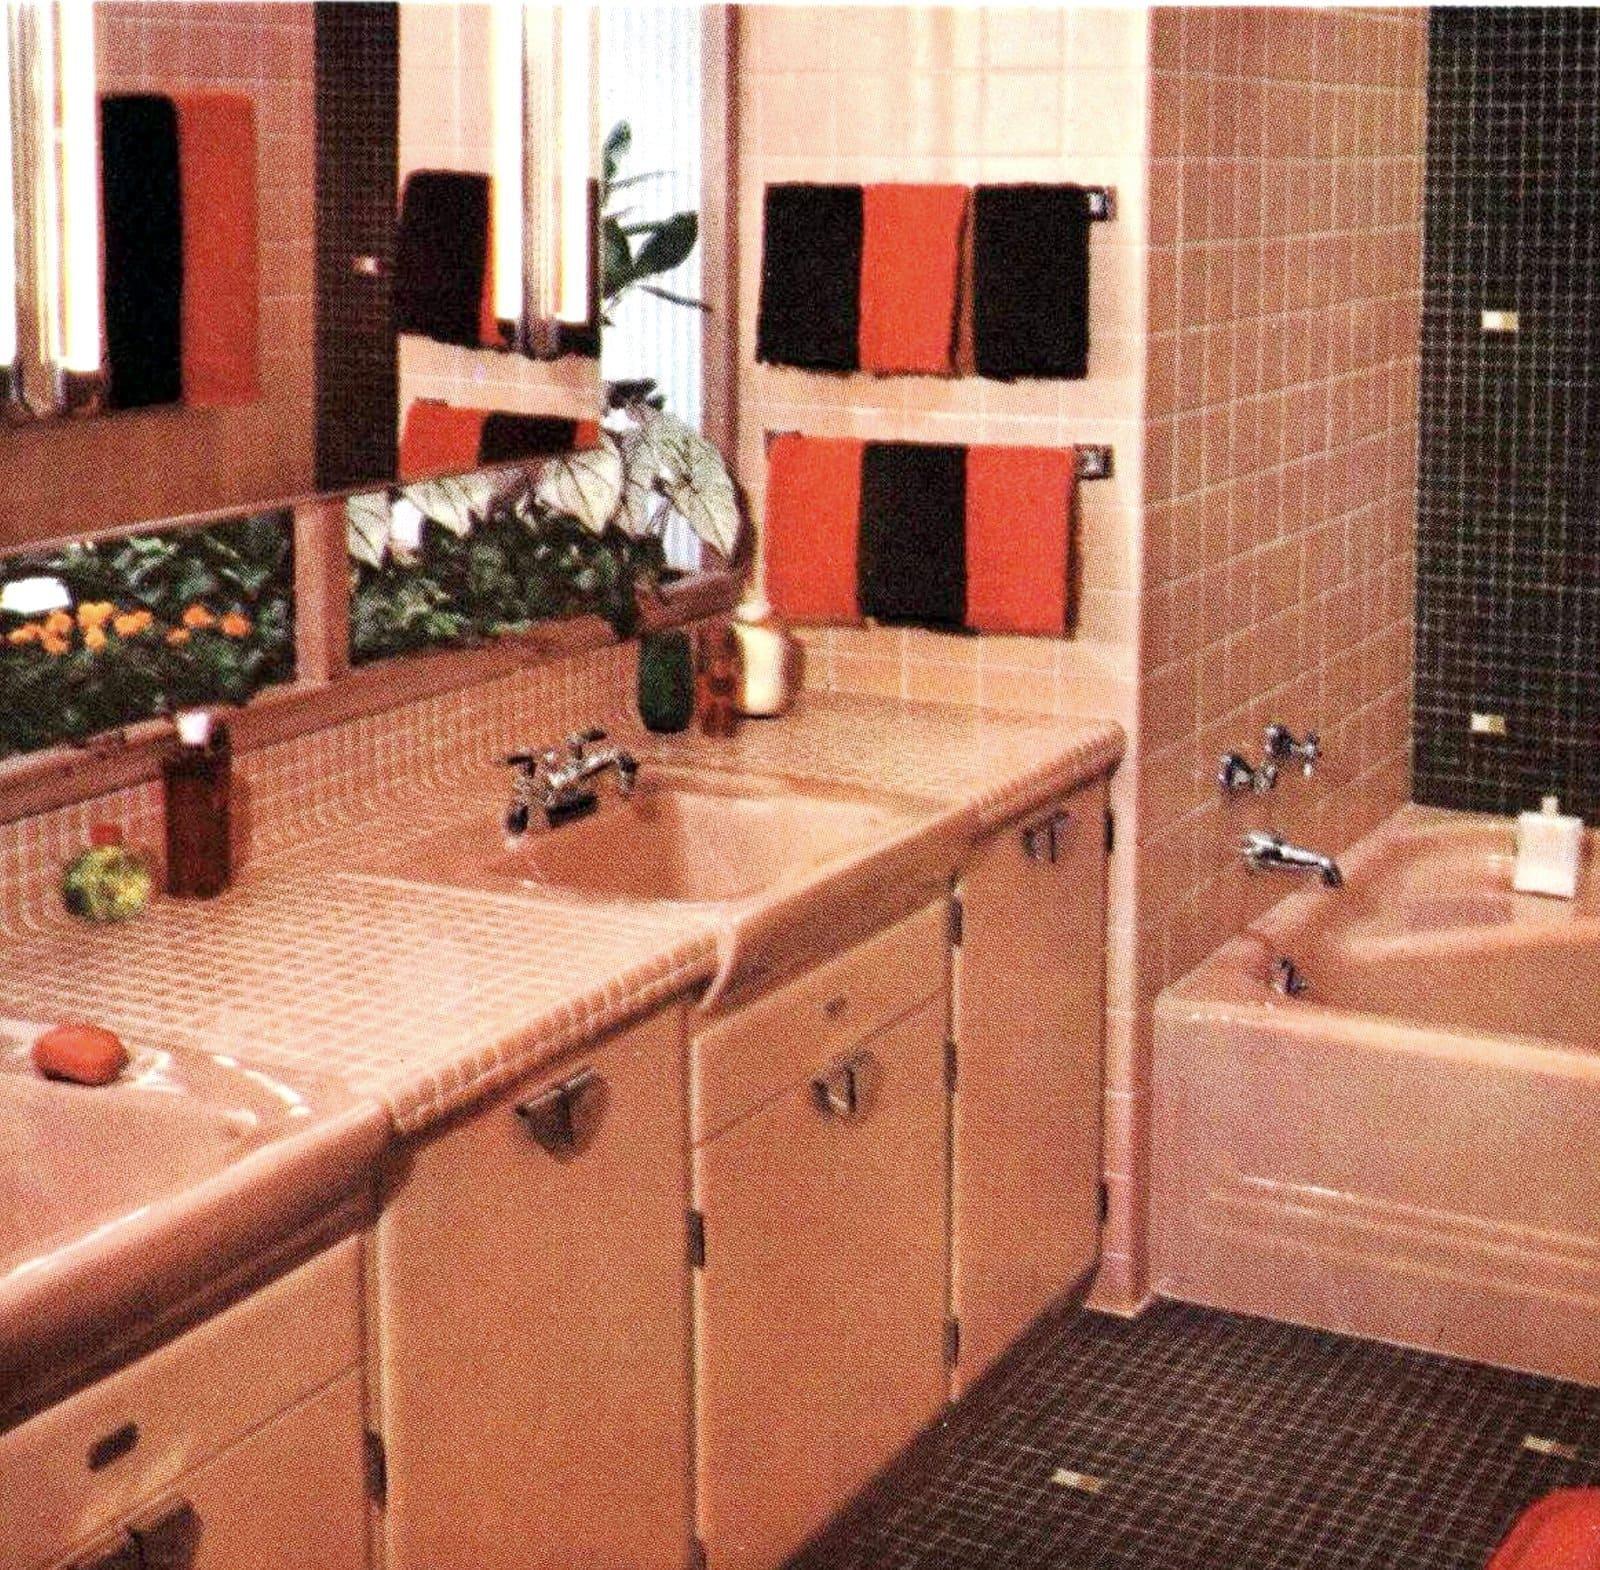 Beige-pink retro fifties bathroom tile style